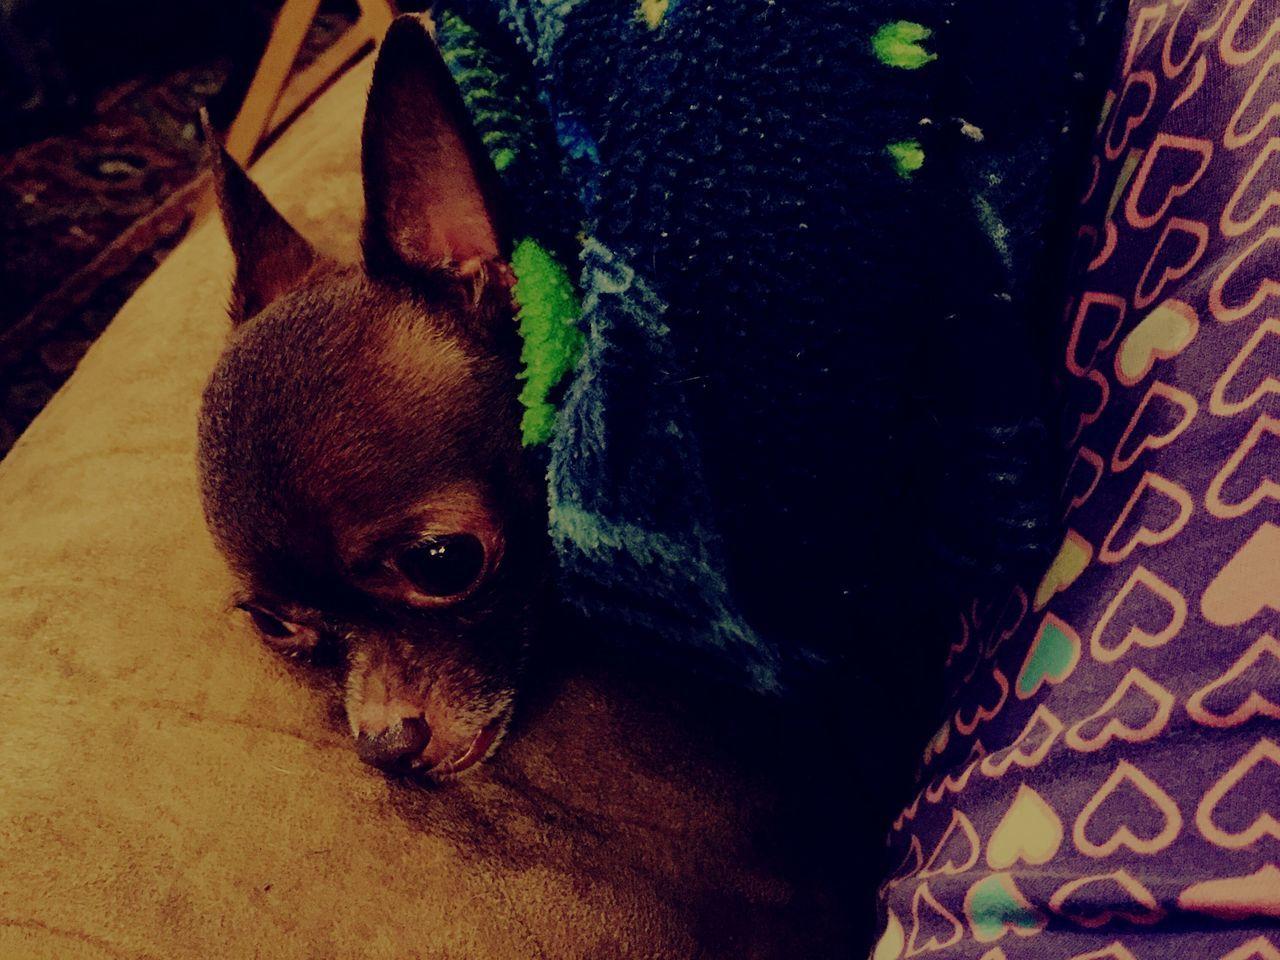 Chihuahualovers Chihuahua Chihuahua Love ♥ Chloe ❤ My Baby Girl <3 Dogs Snugglebuddy Adult Tinydog